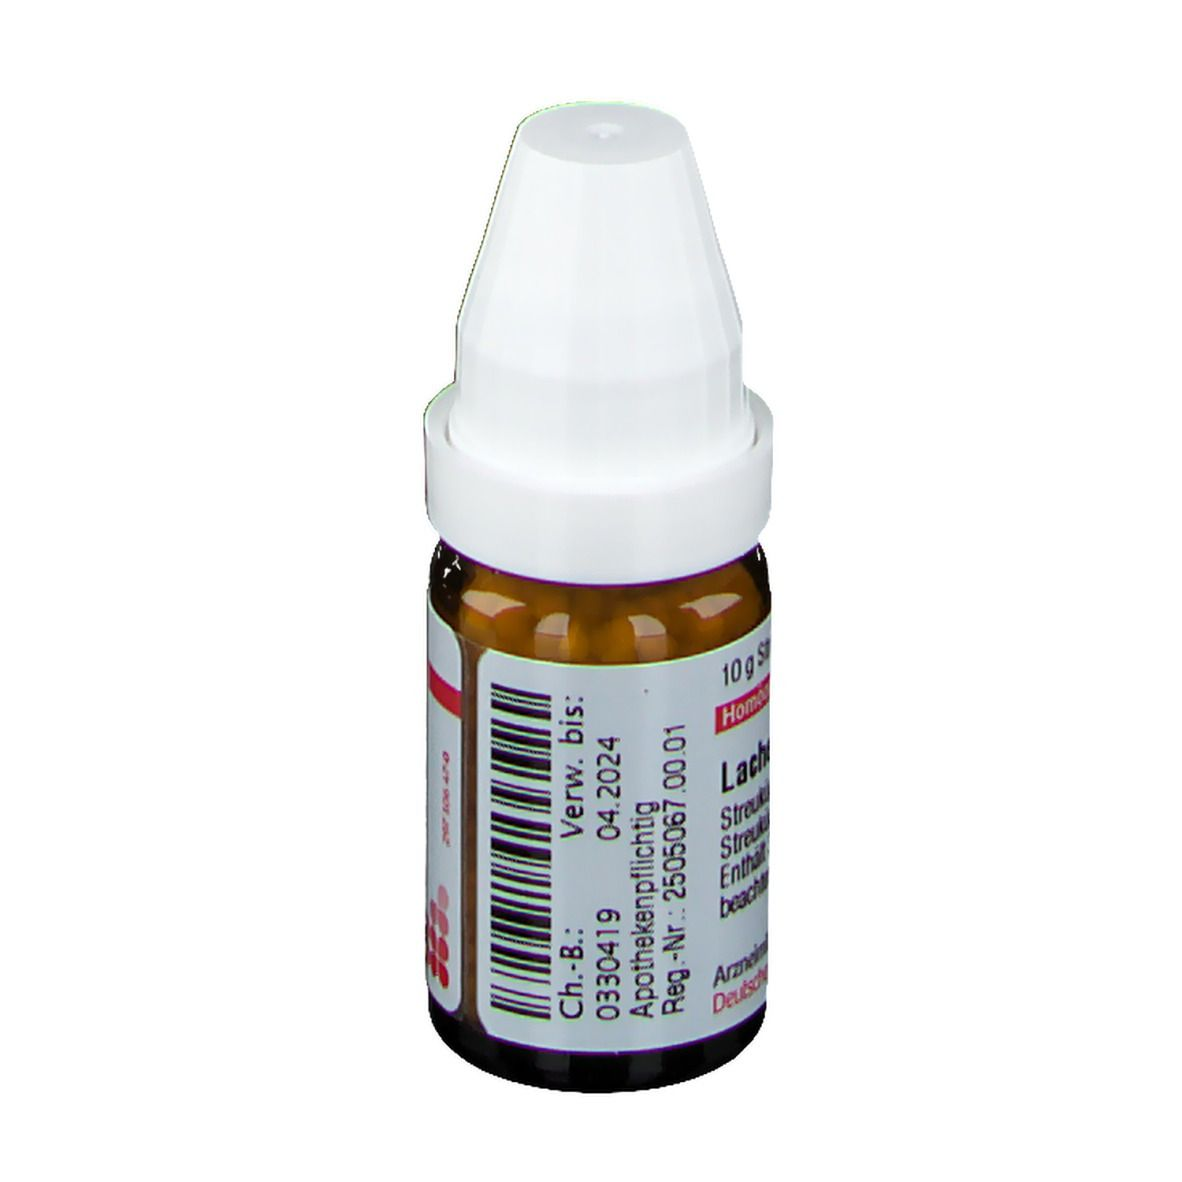 DHU lachesis C30